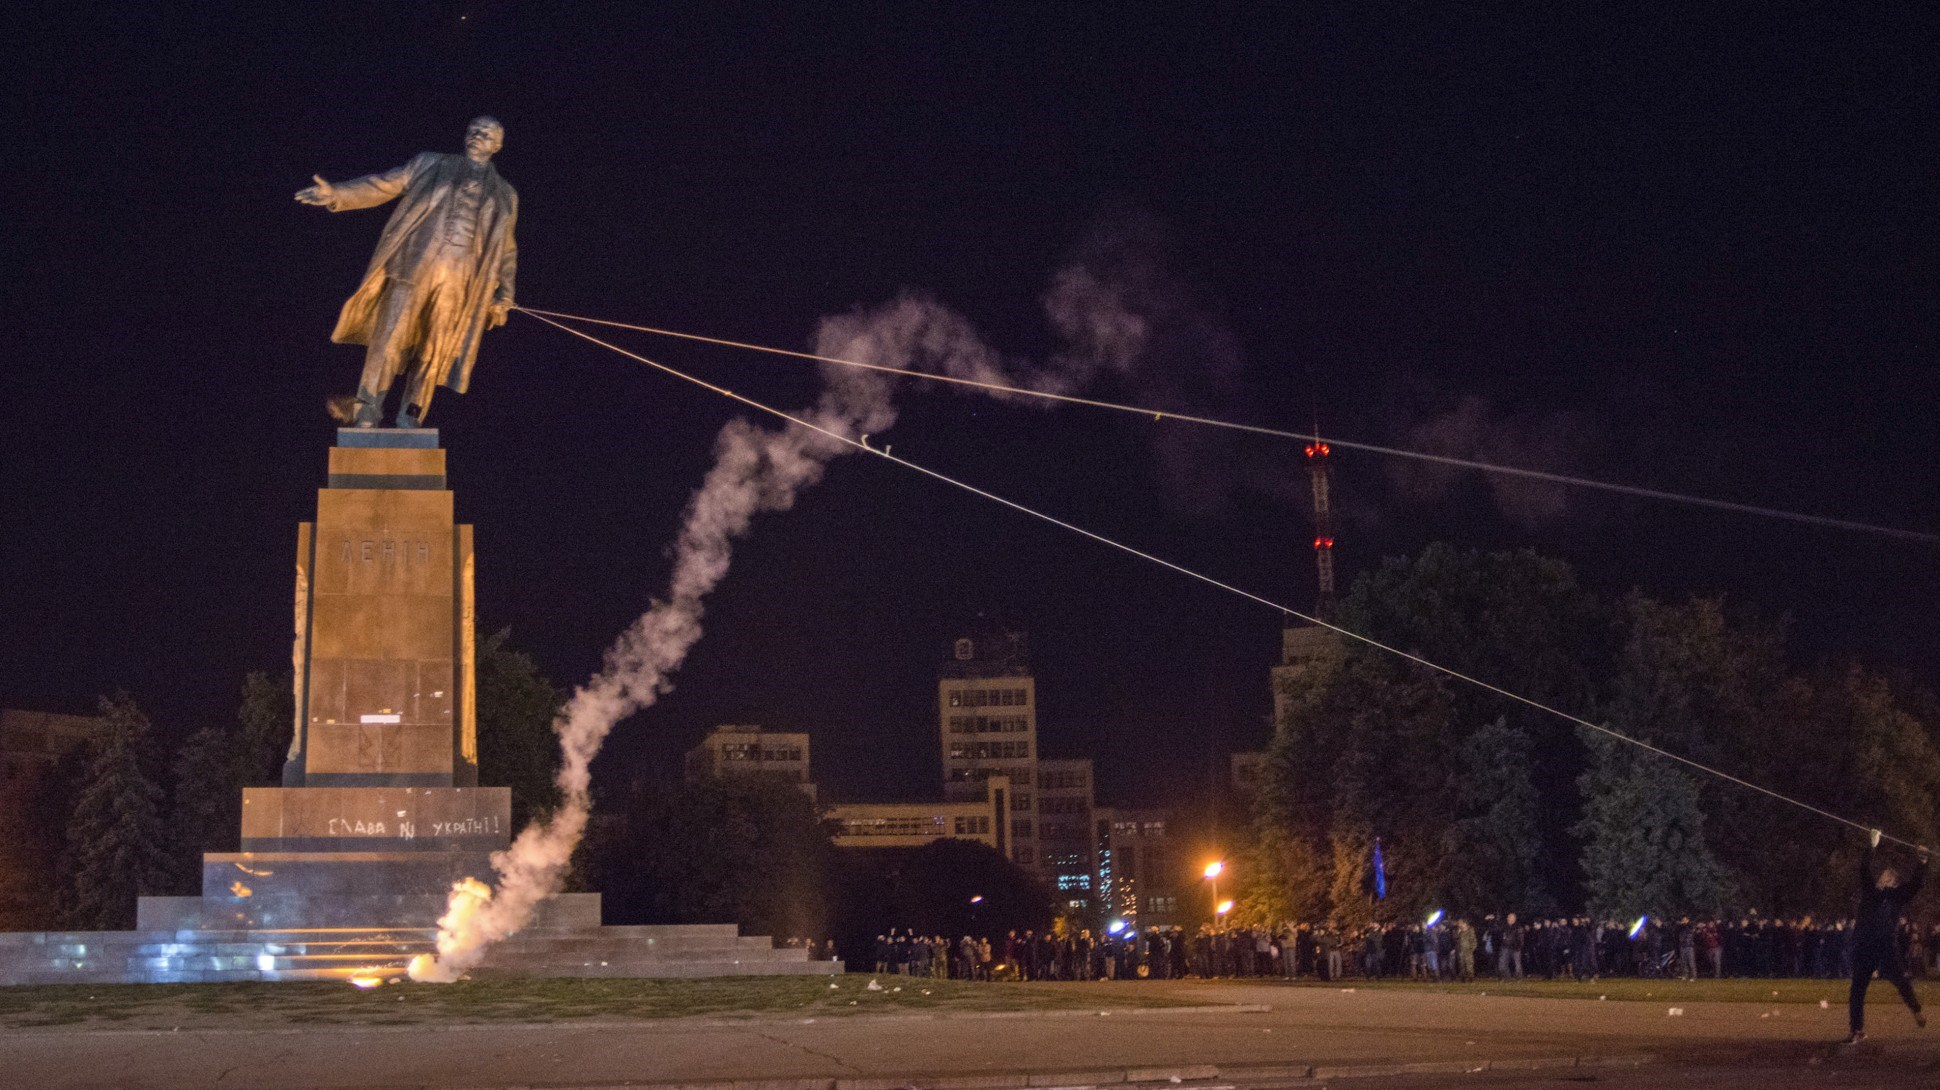 Oυκρανία: Αποκαθήλωσαν το επιβλητικό άγαλμα του Λένιν